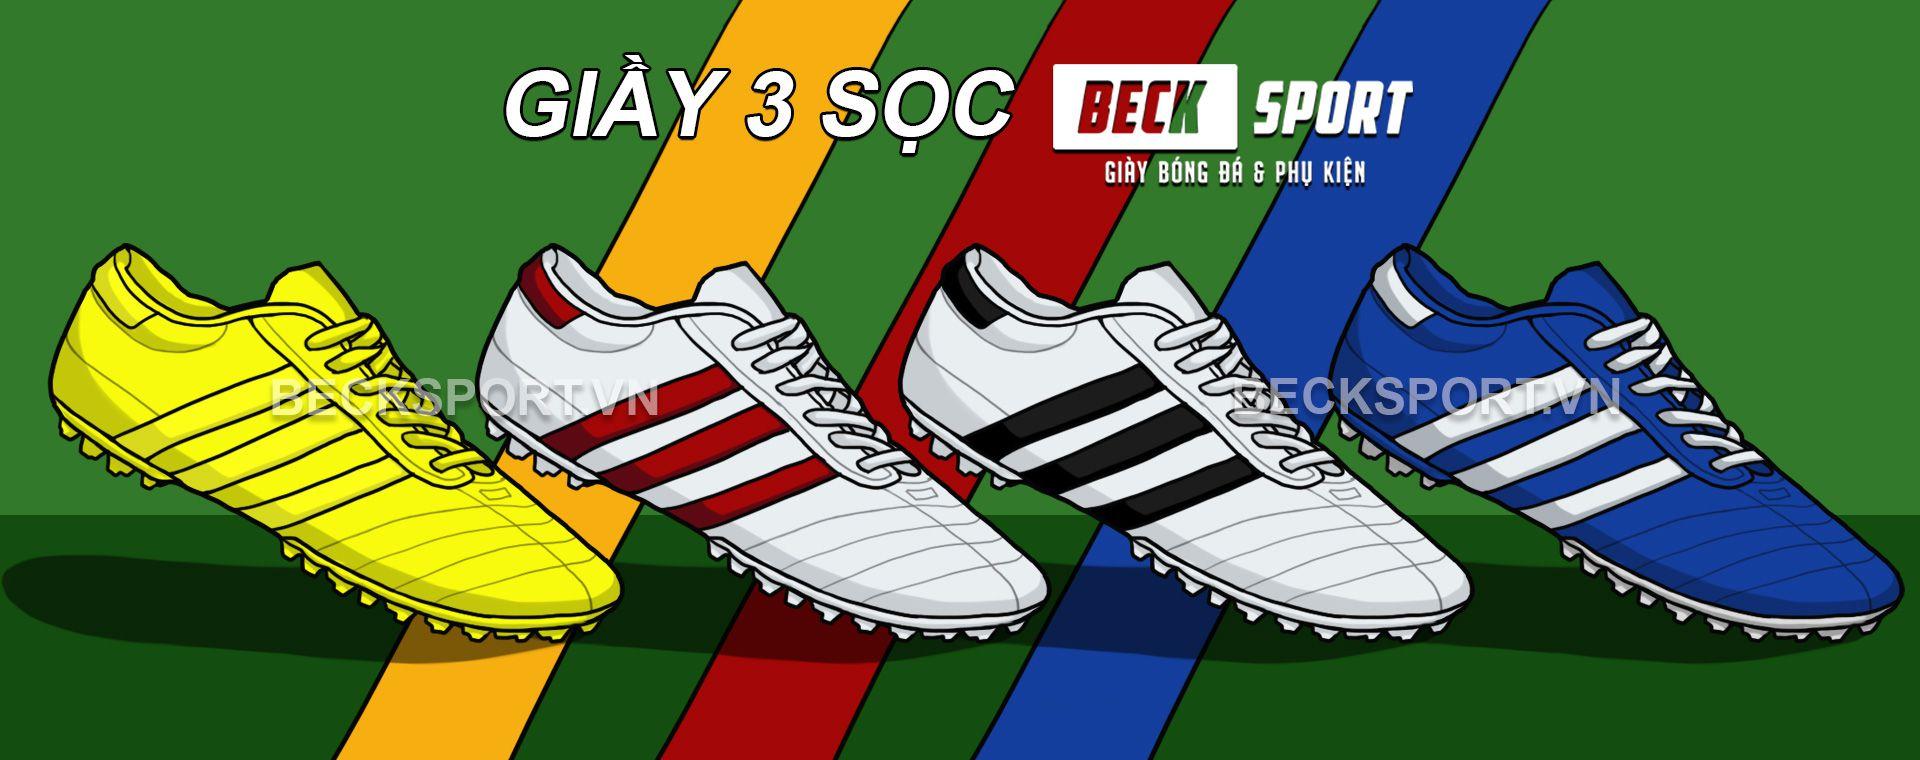 Beck 1 Màu